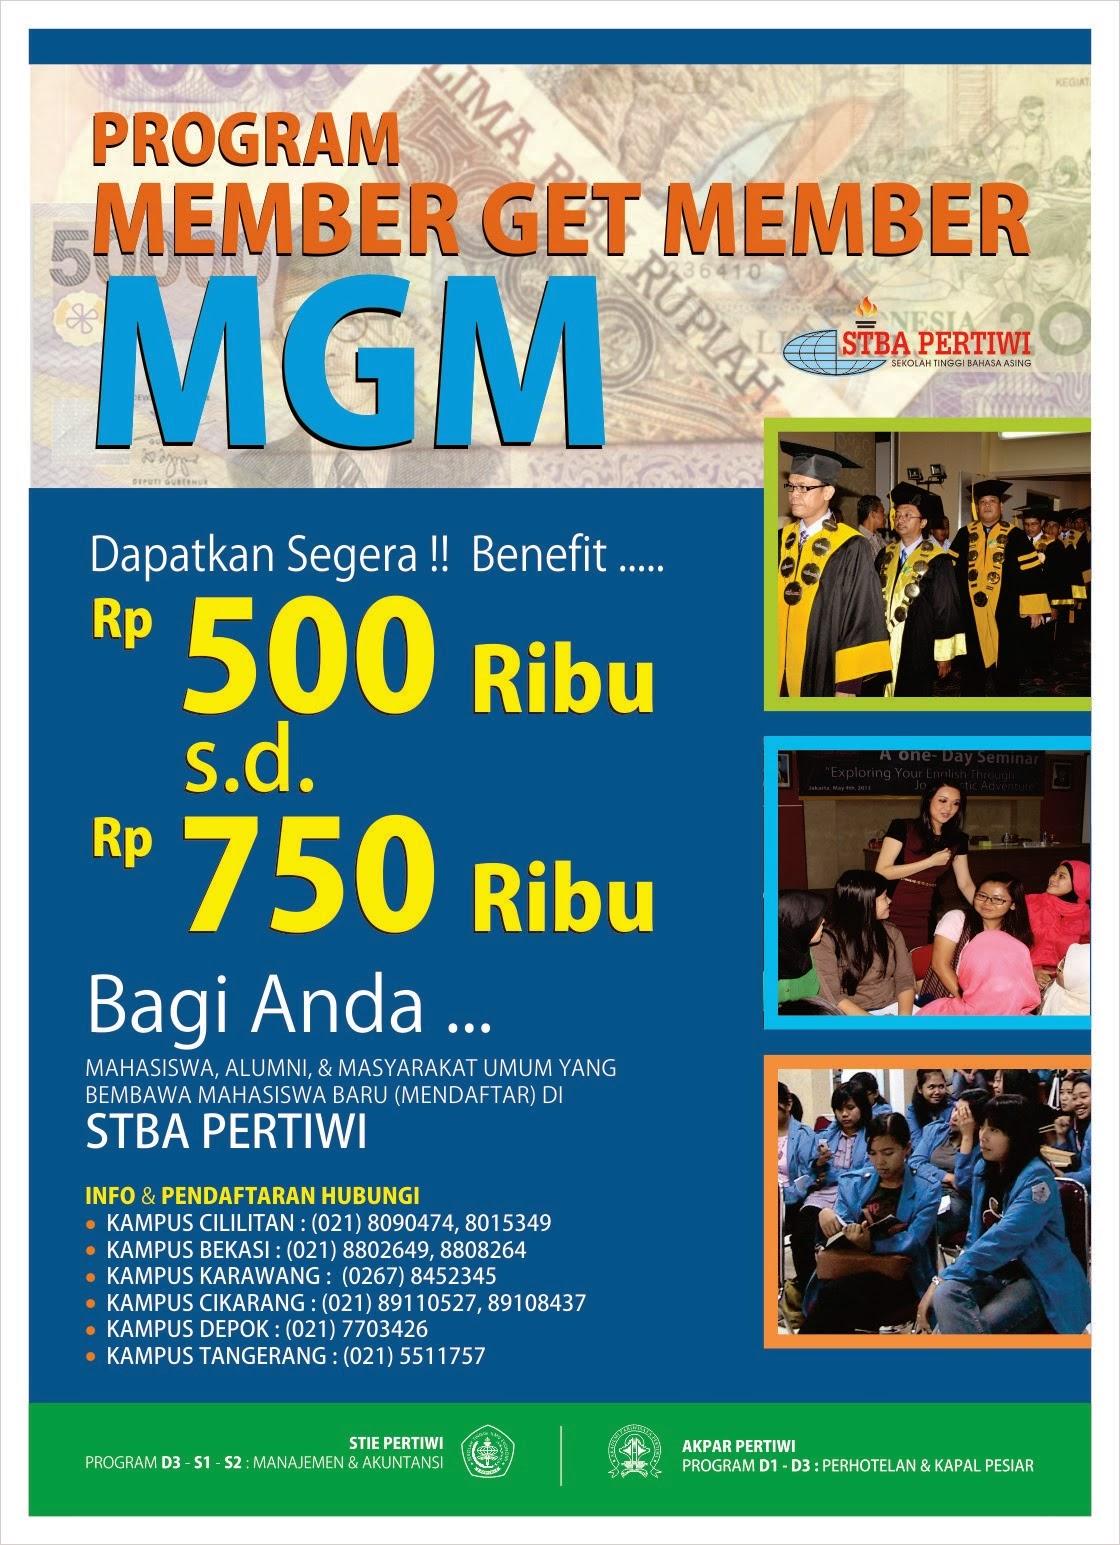 INFO MGM